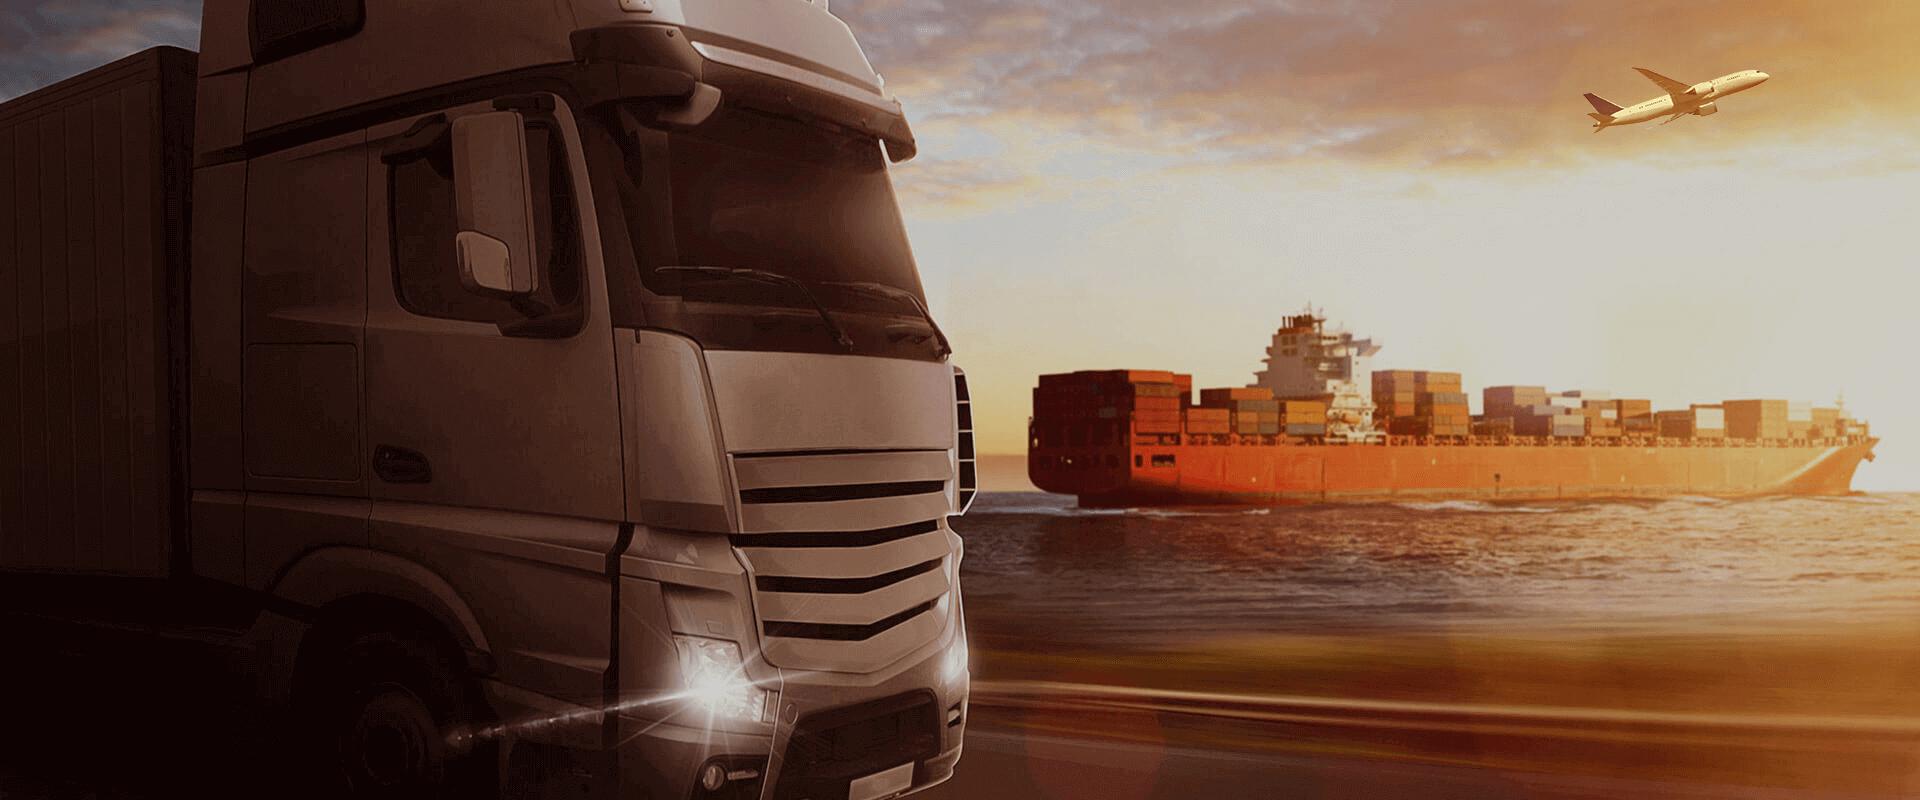 alfajar_slider-image_int_freight_service